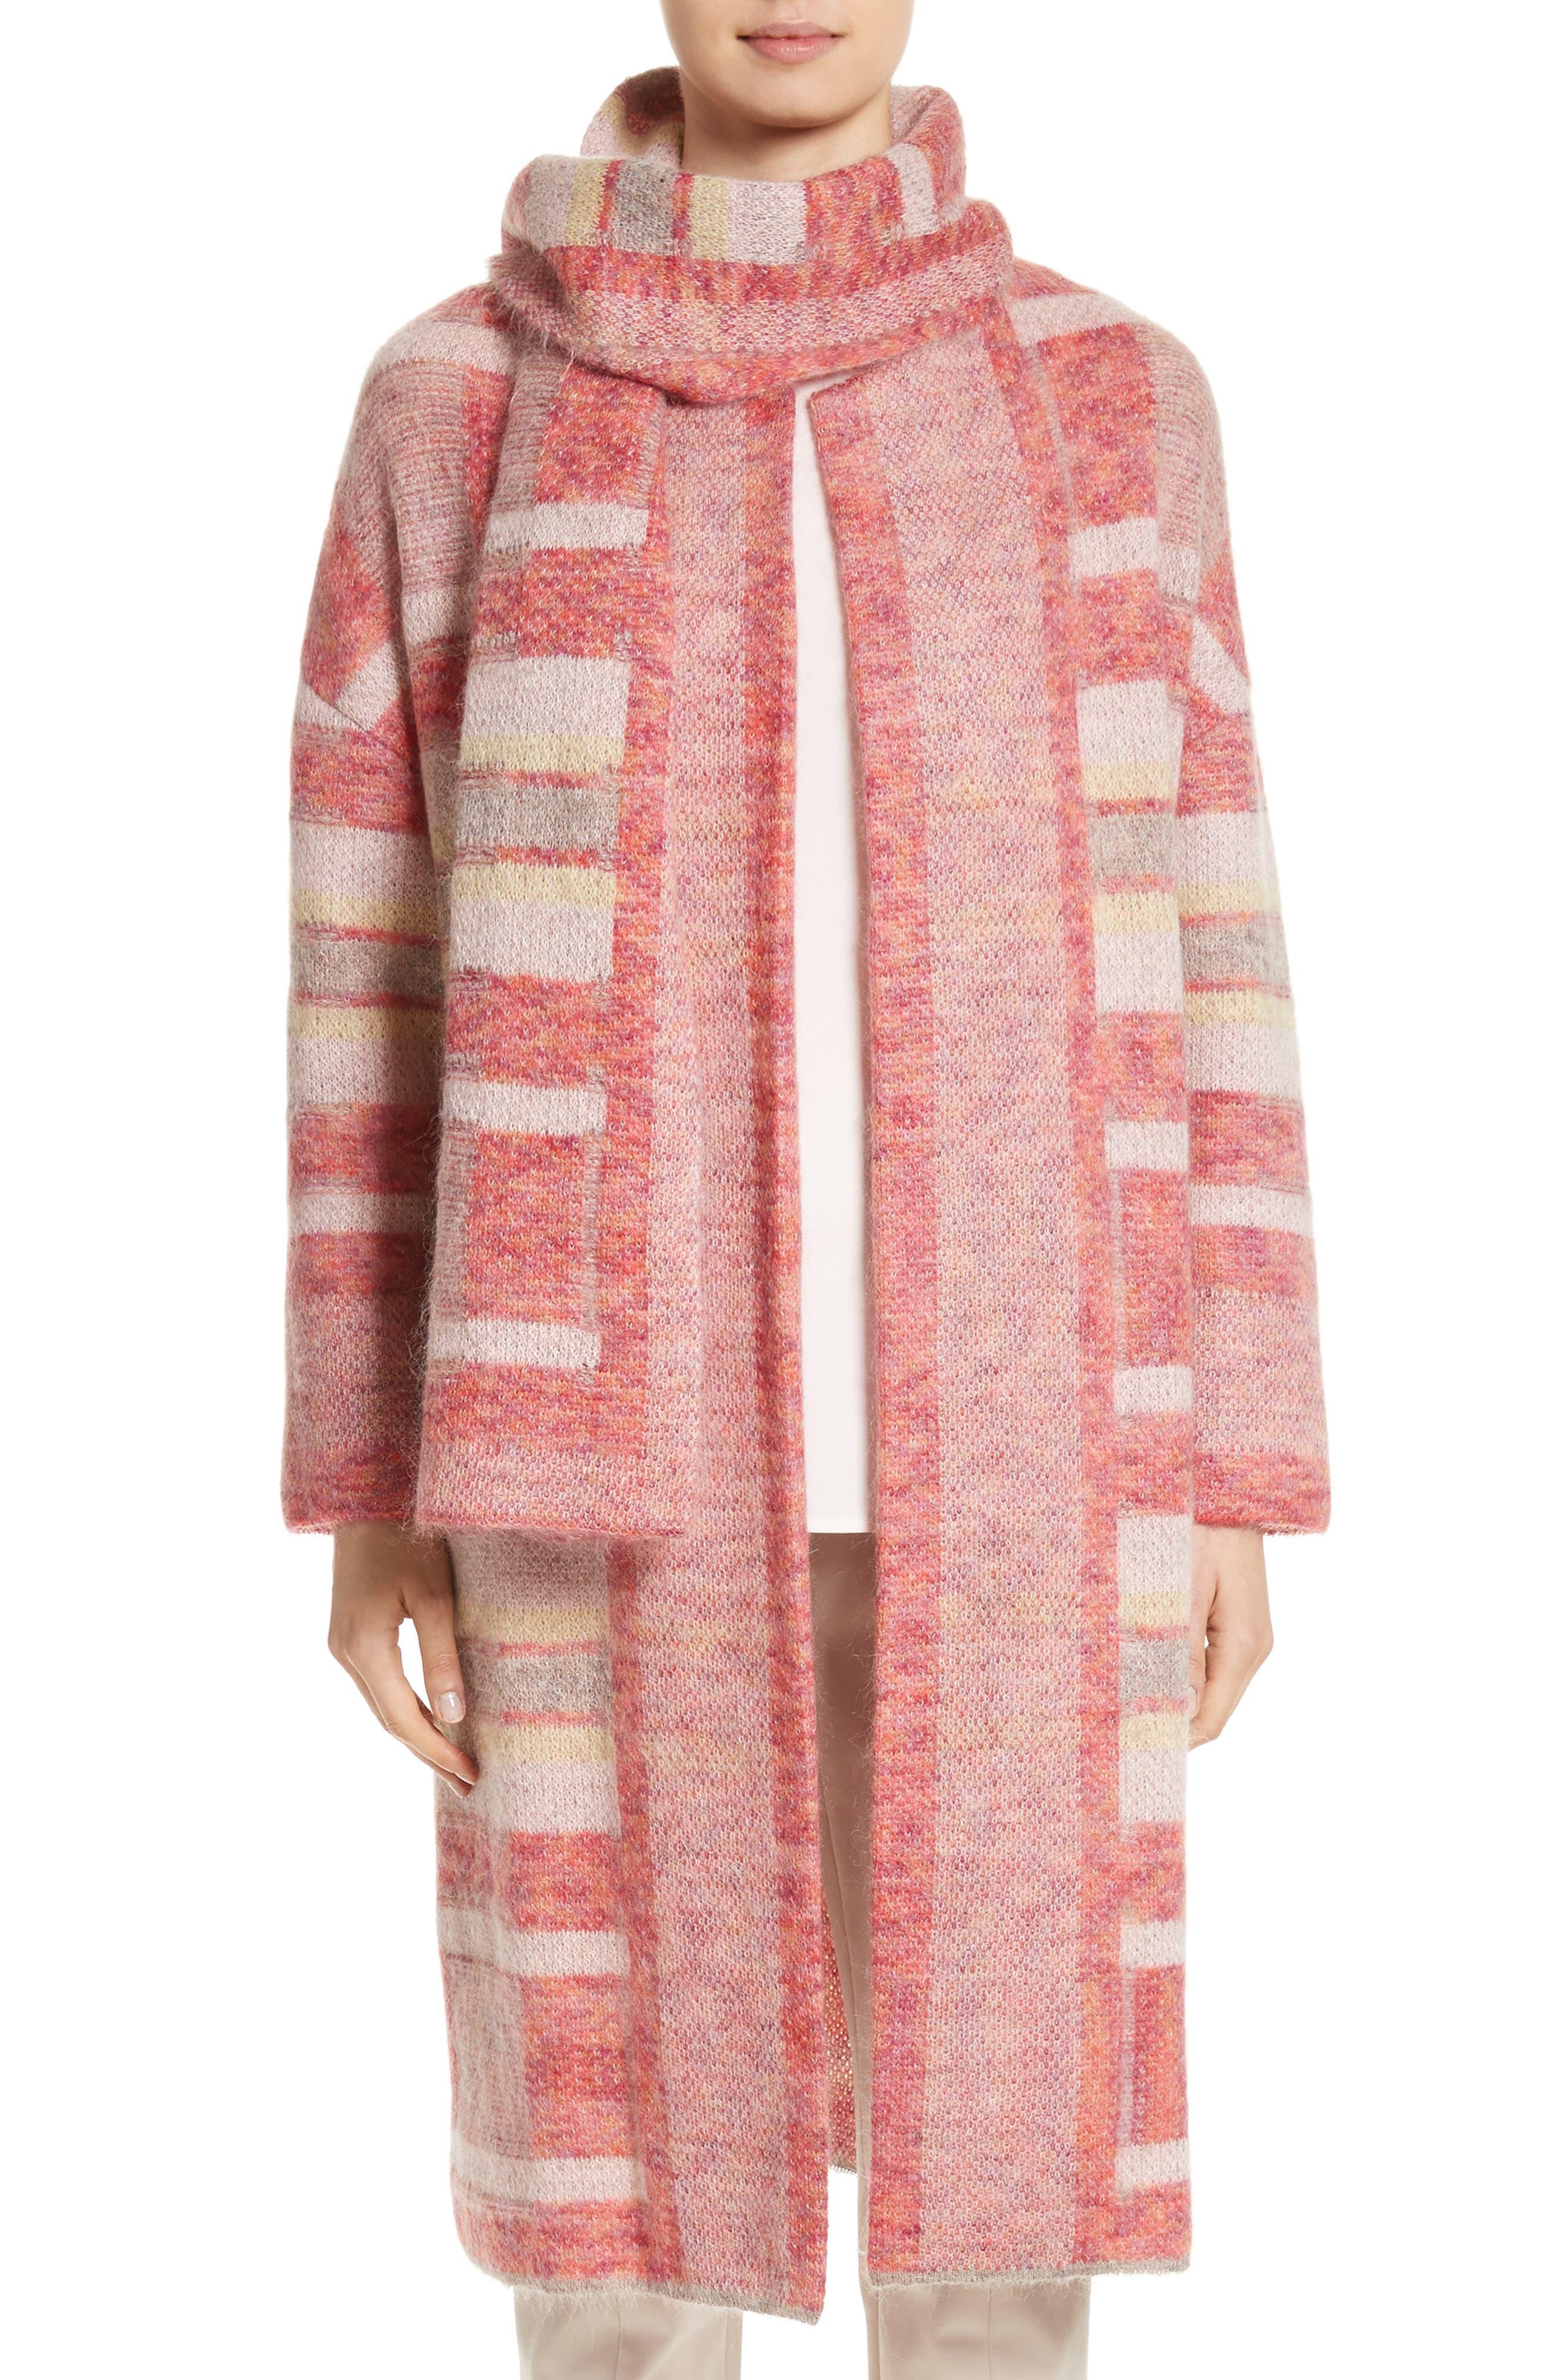 Main Image - St. John Collection Lofty Knit Plaid Blanket Coat